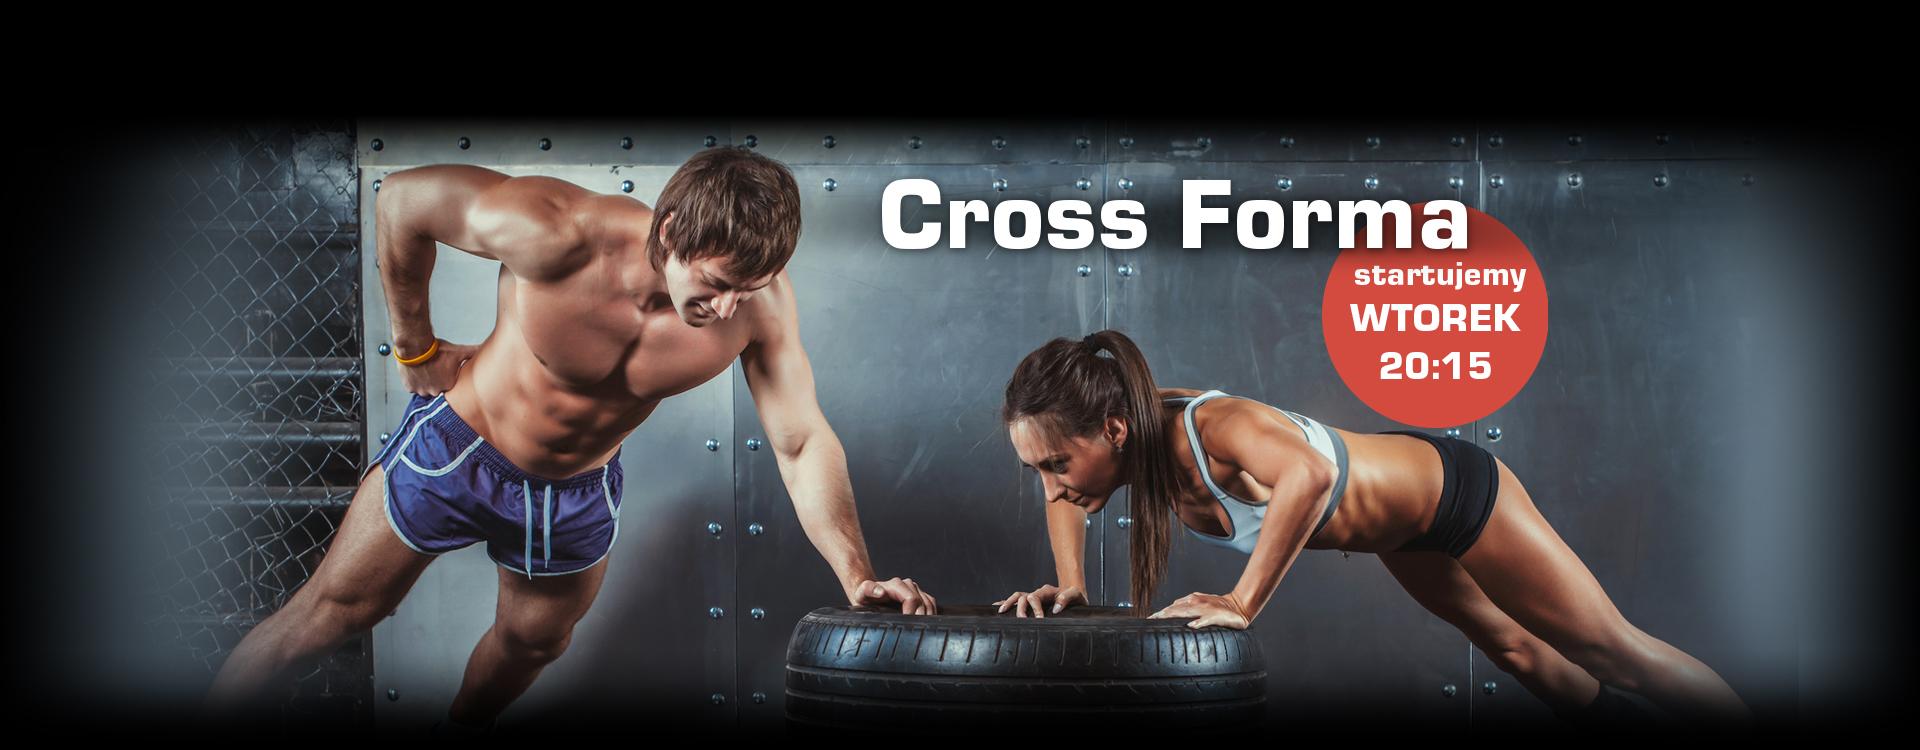 SF-slider-Cross-Forma